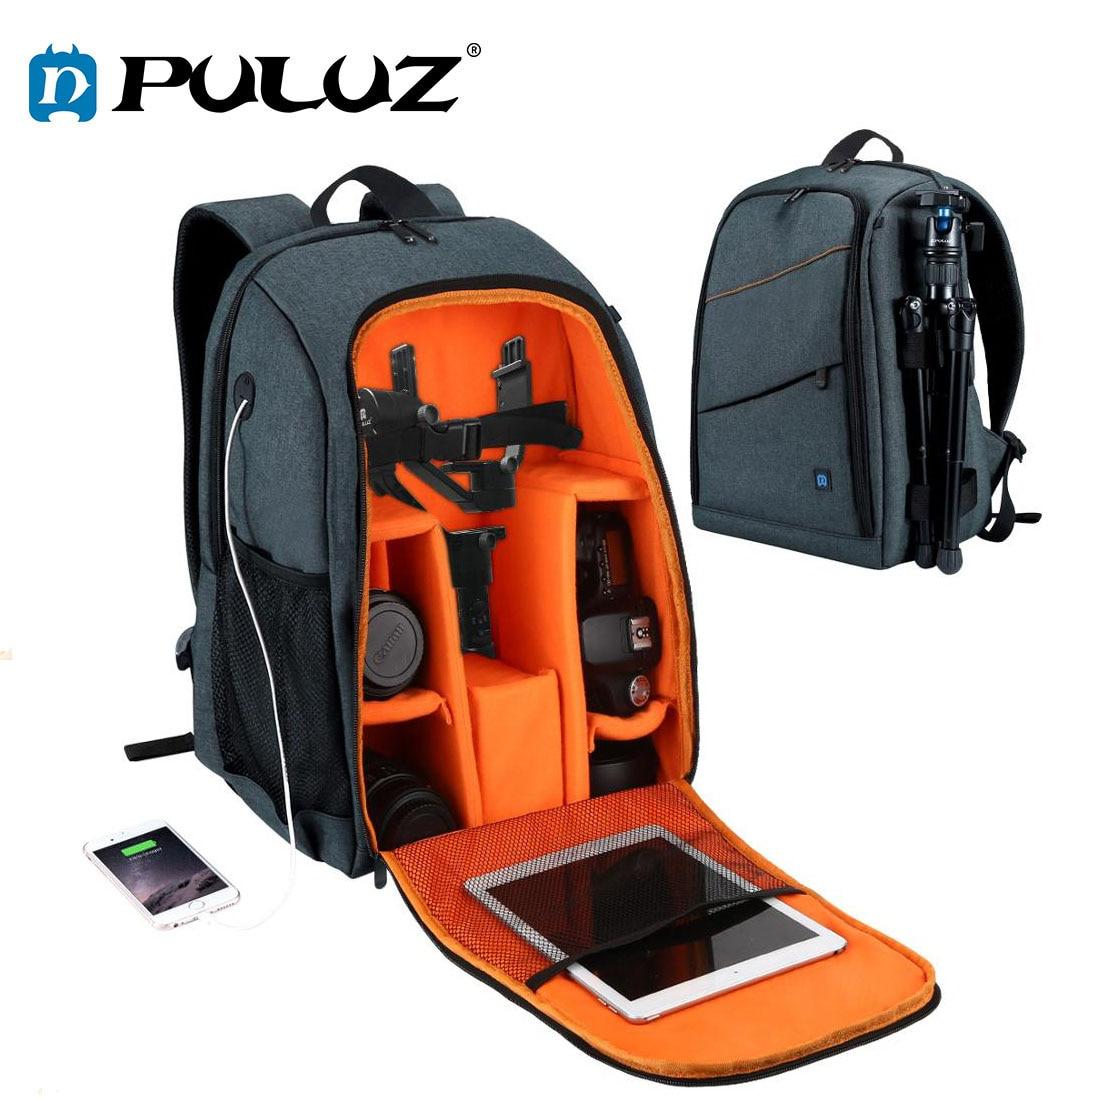 PULUZ-حقيبة ظهر للكمبيوتر المحمول مقاومة للماء ومضادة للخدش ، حقيبة كتف مزدوجة ، حقيبة كاميرا رقمية DSLR ، حقيبة ظهر للكمبيوتر المحمول